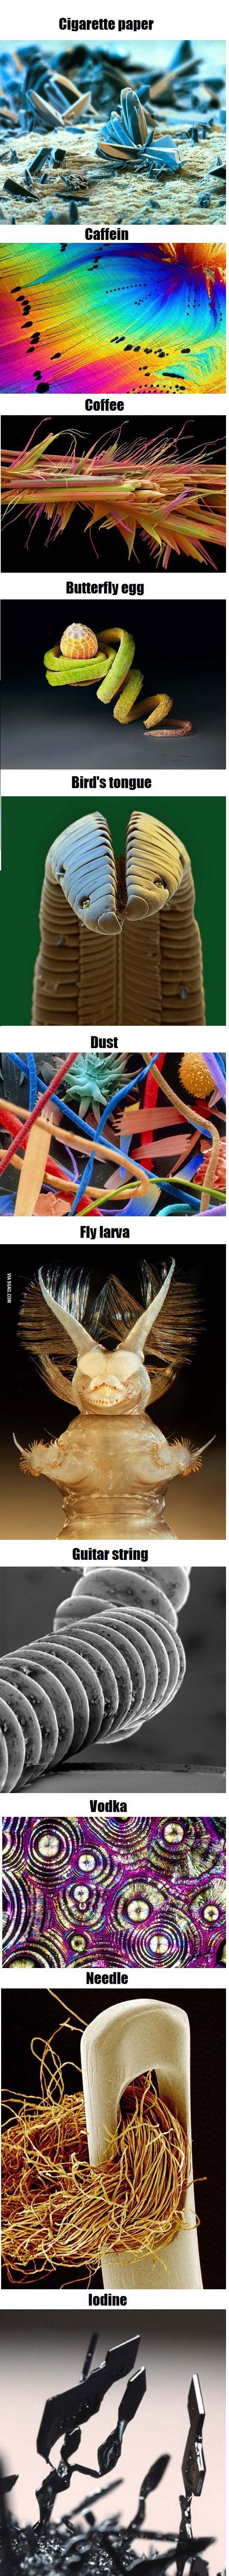 Some interesting stuff under microscope...